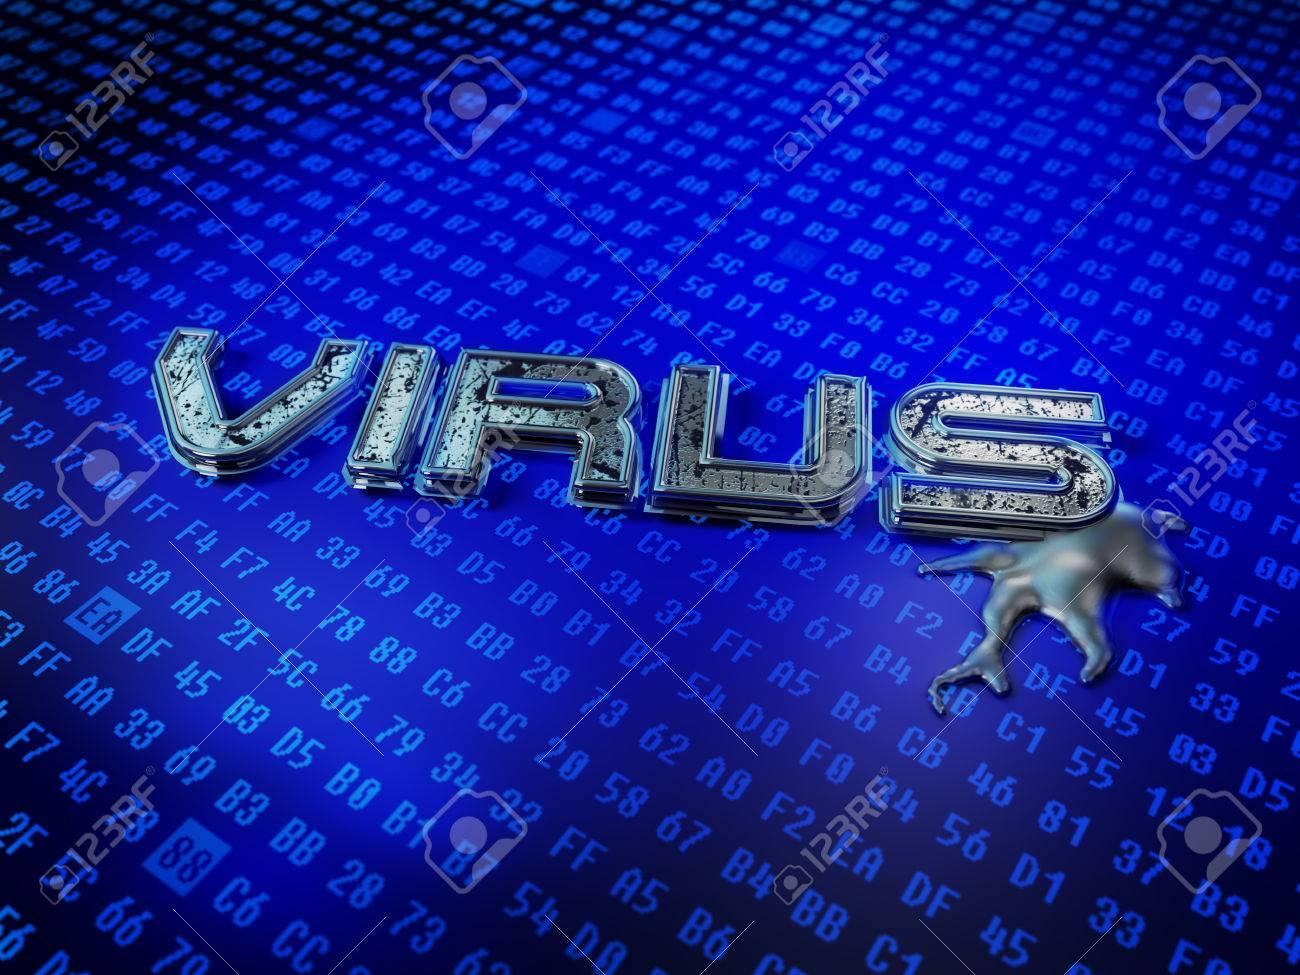 How to write a c virus